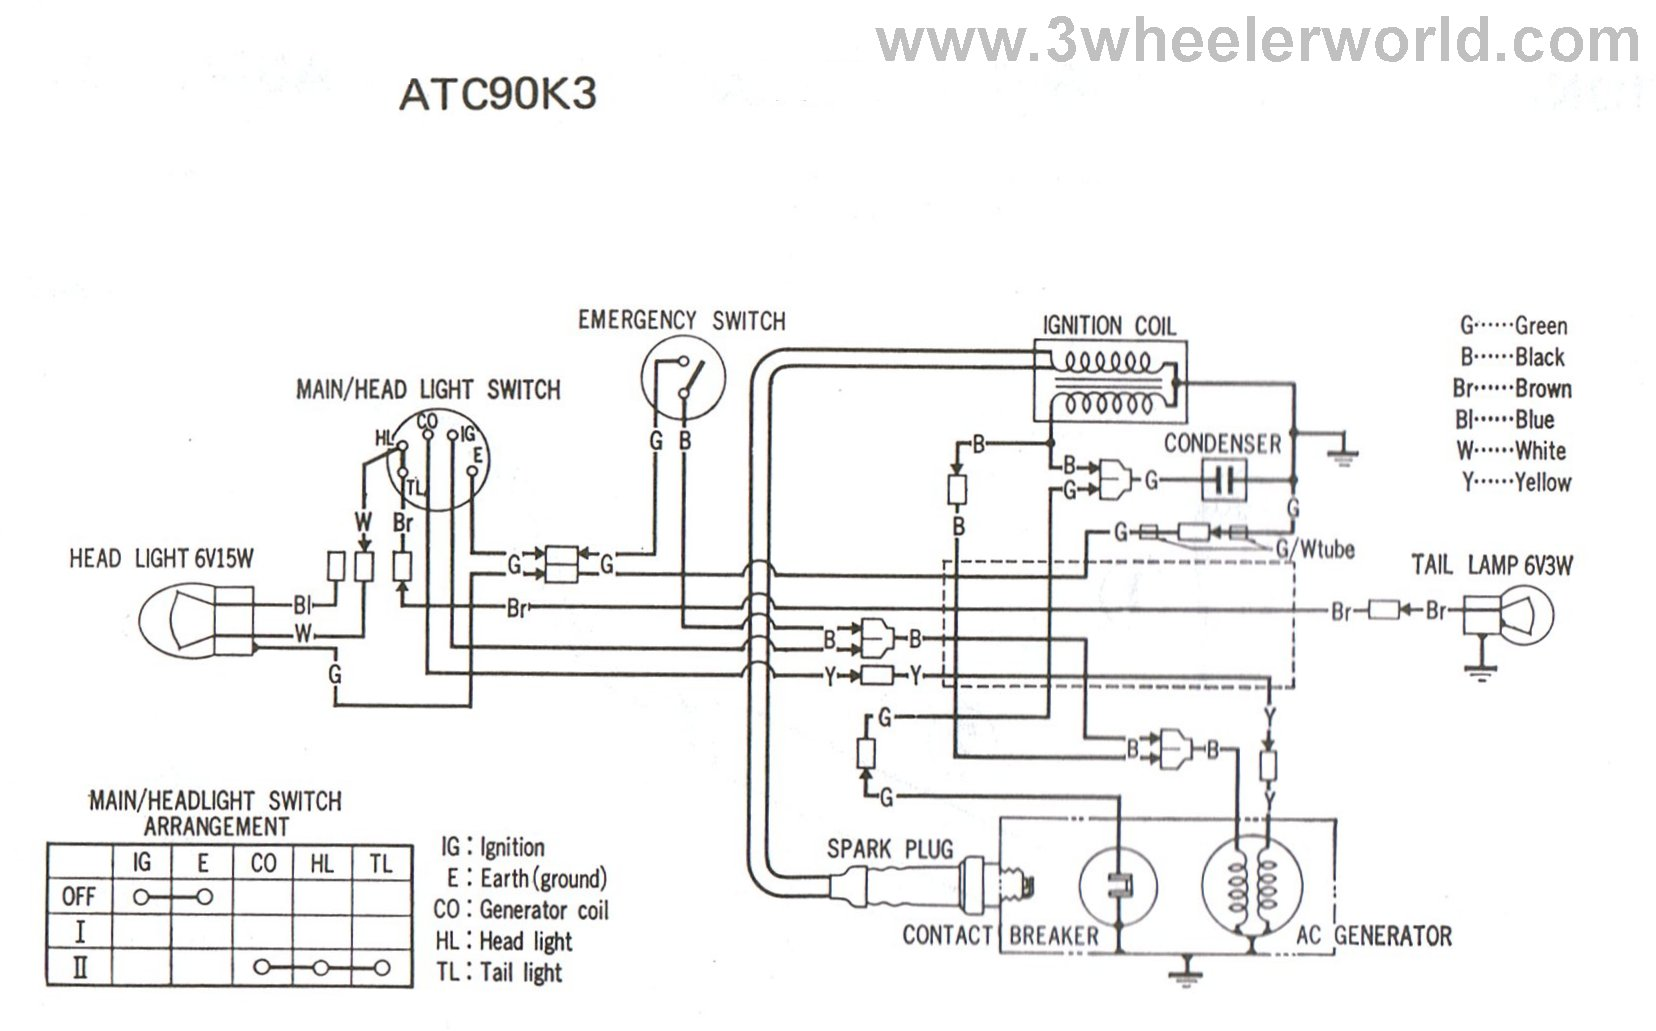 honda xl80 wiring diagram kawasaki en500 engine diagram kawasaki wiring diagrams